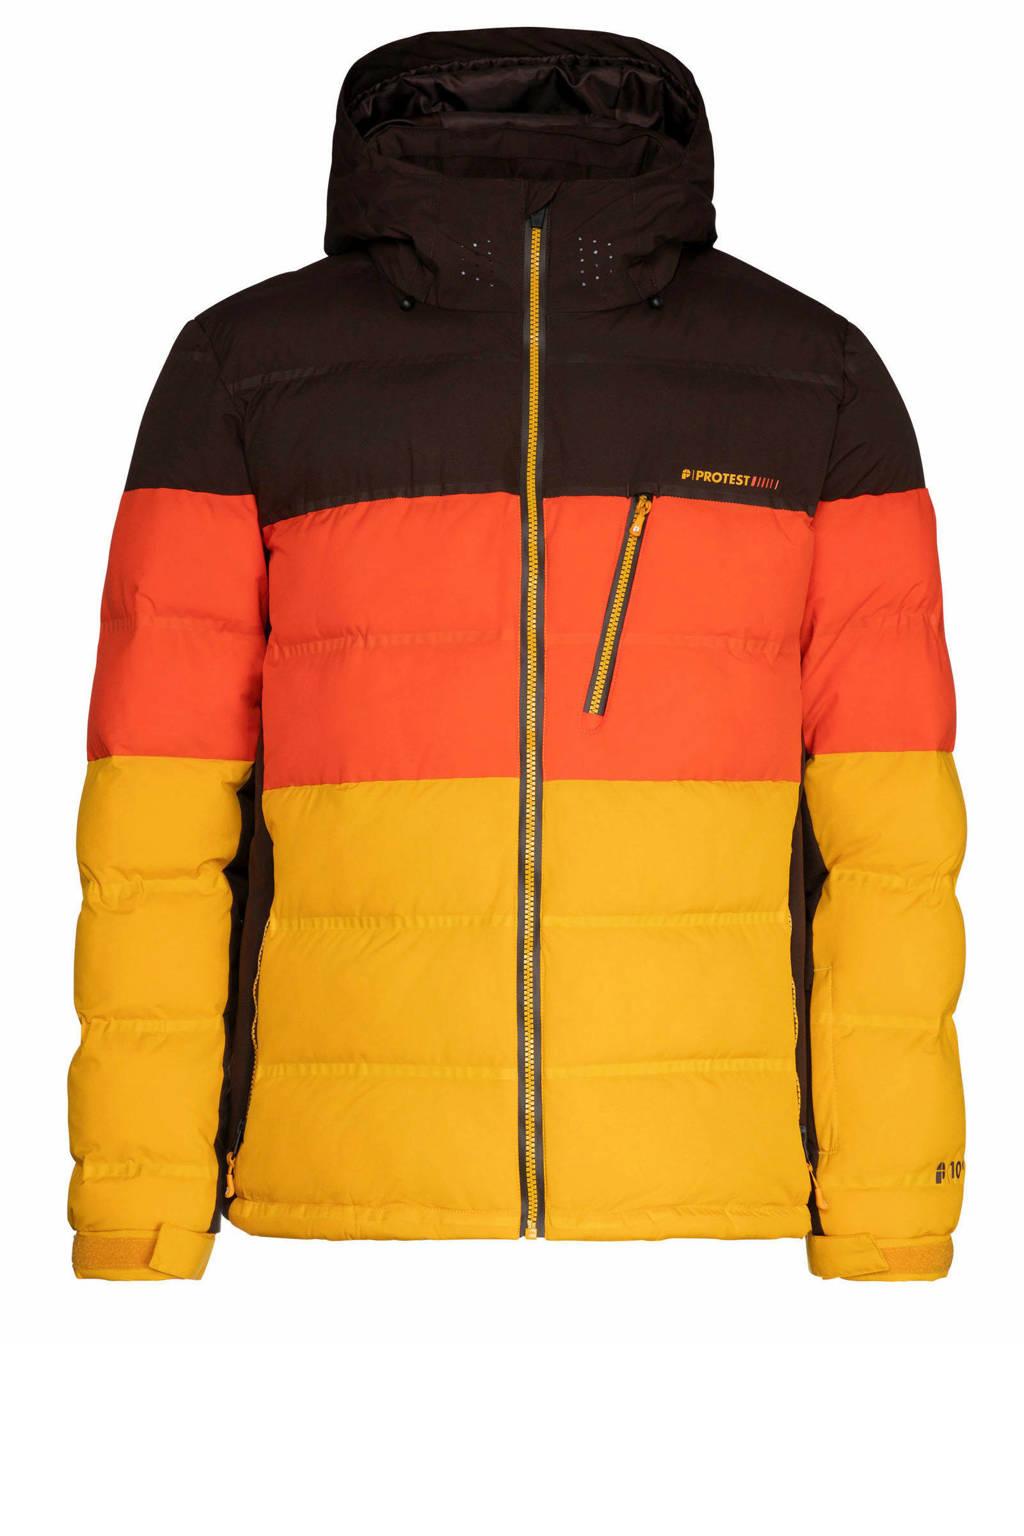 Protest Blur ski-jack zwart/oranje/geel, Dark yellow